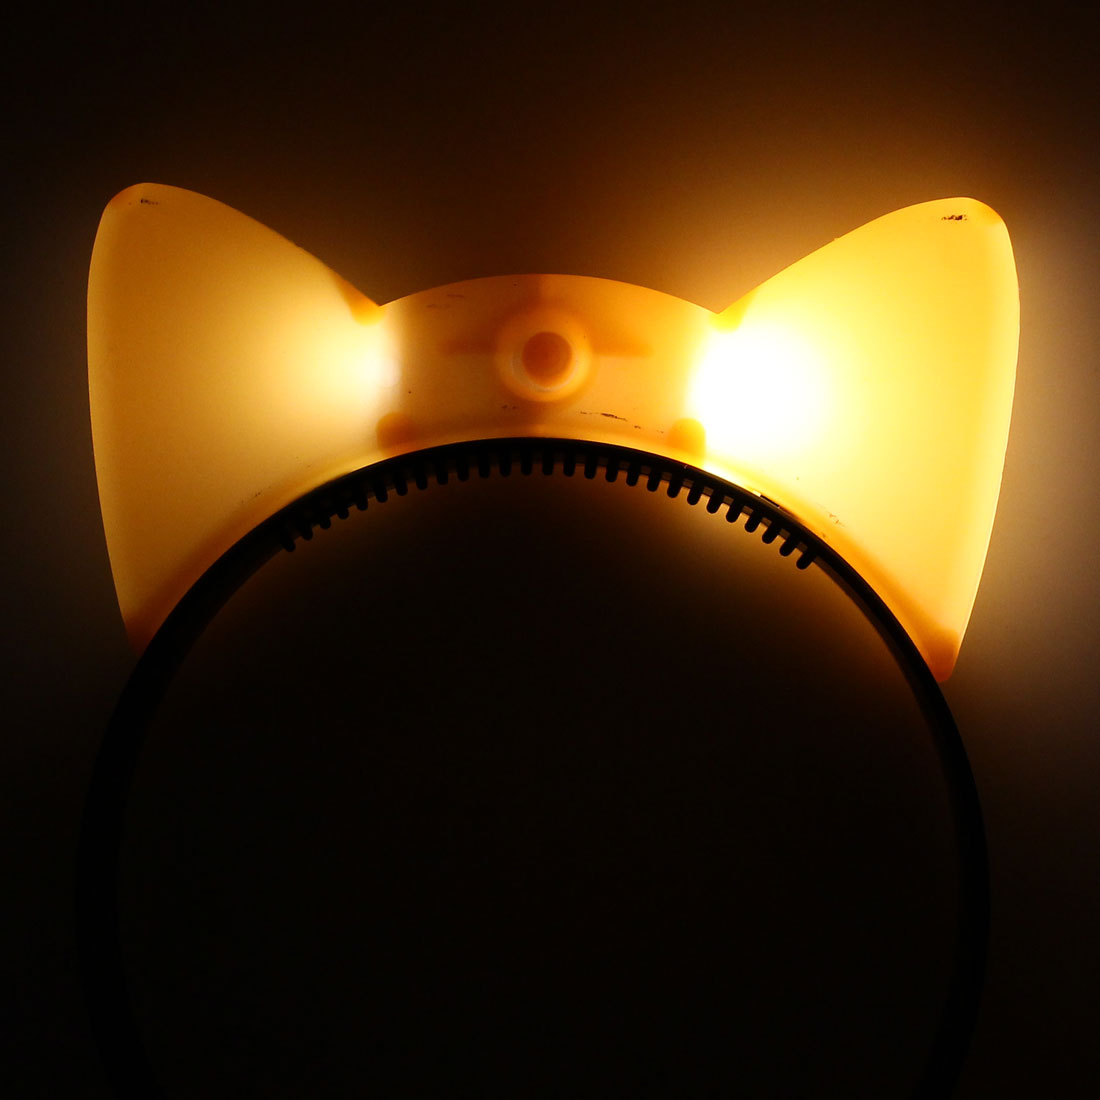 Cosplay Flash  Cat Ear Light Blinking Hair Band Hairband Headband Orange - image 2 de 3